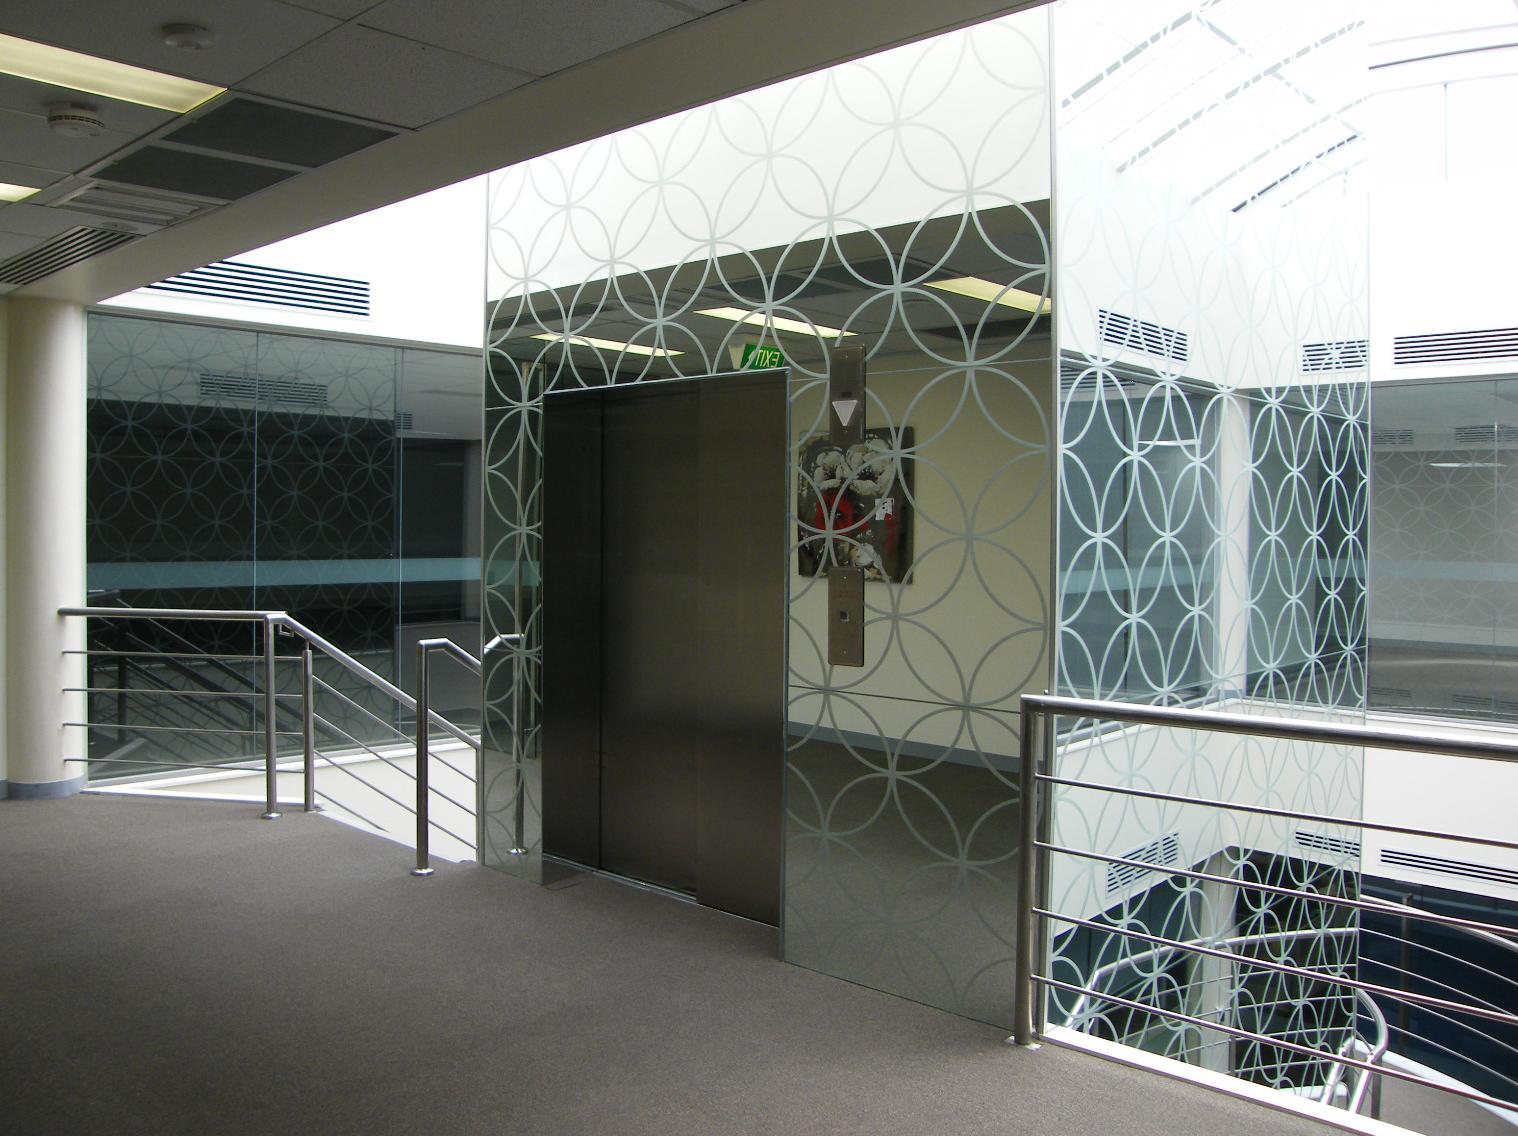 Lift lobby refurbishment